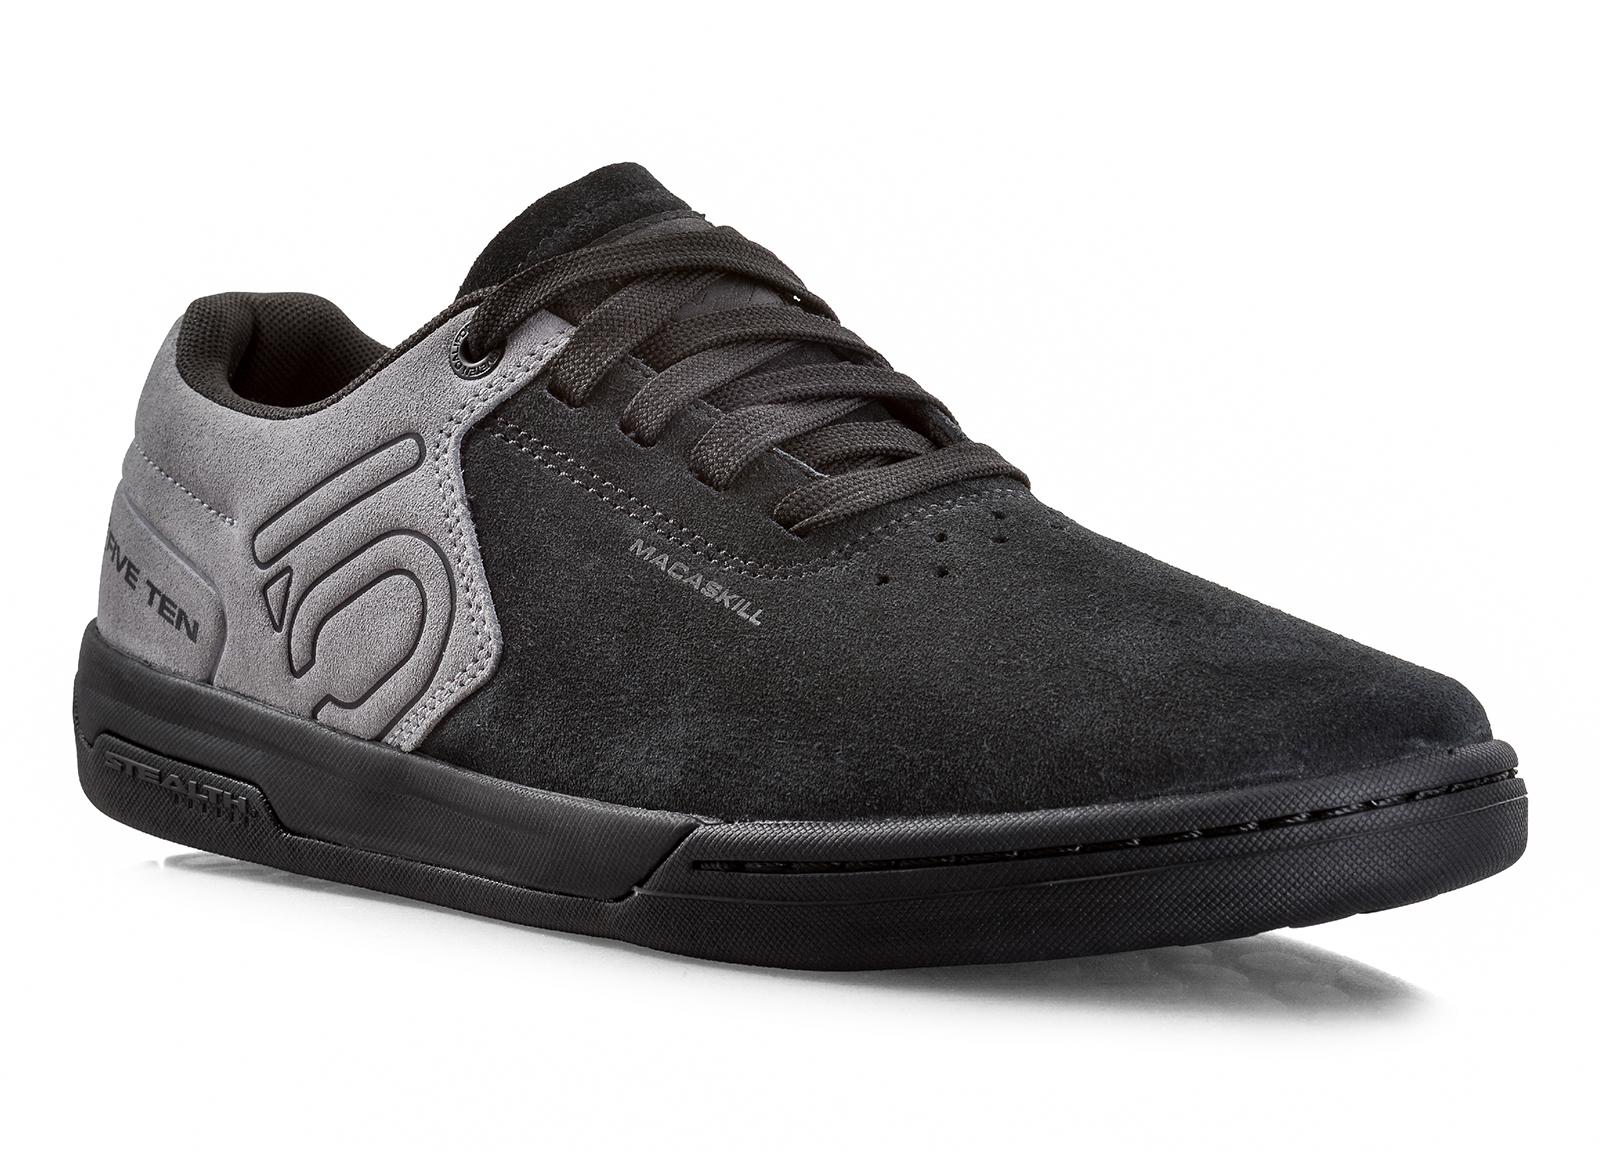 Fiveten Danny Macaskill Shoes Review